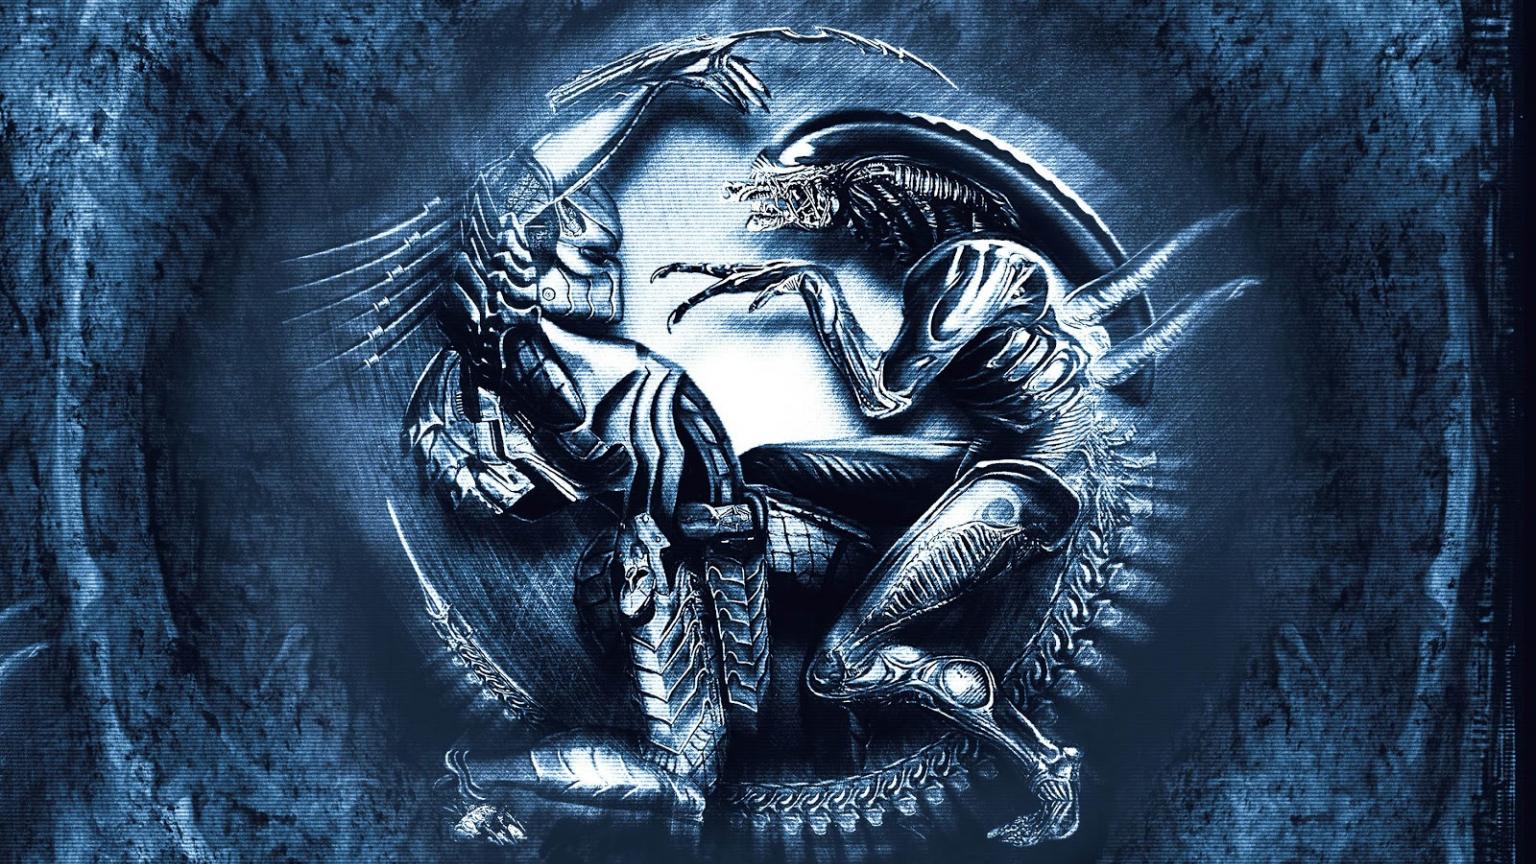 download HD PC Desktop Wallpapers Alien VS Predator Wallpaper 1536x864